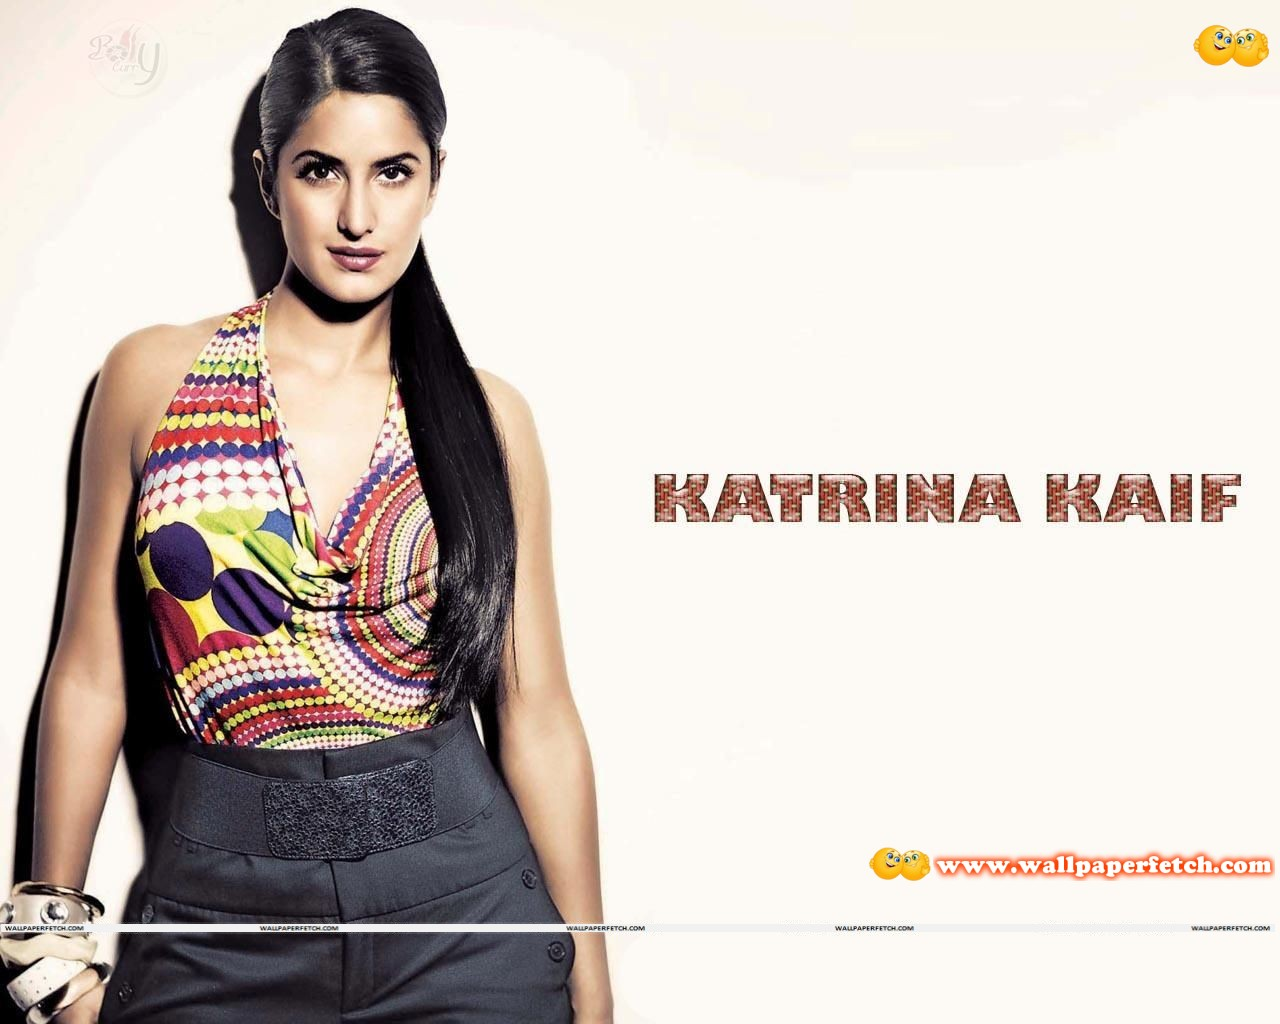 katrina kiaf wallpapers pack - photo #38